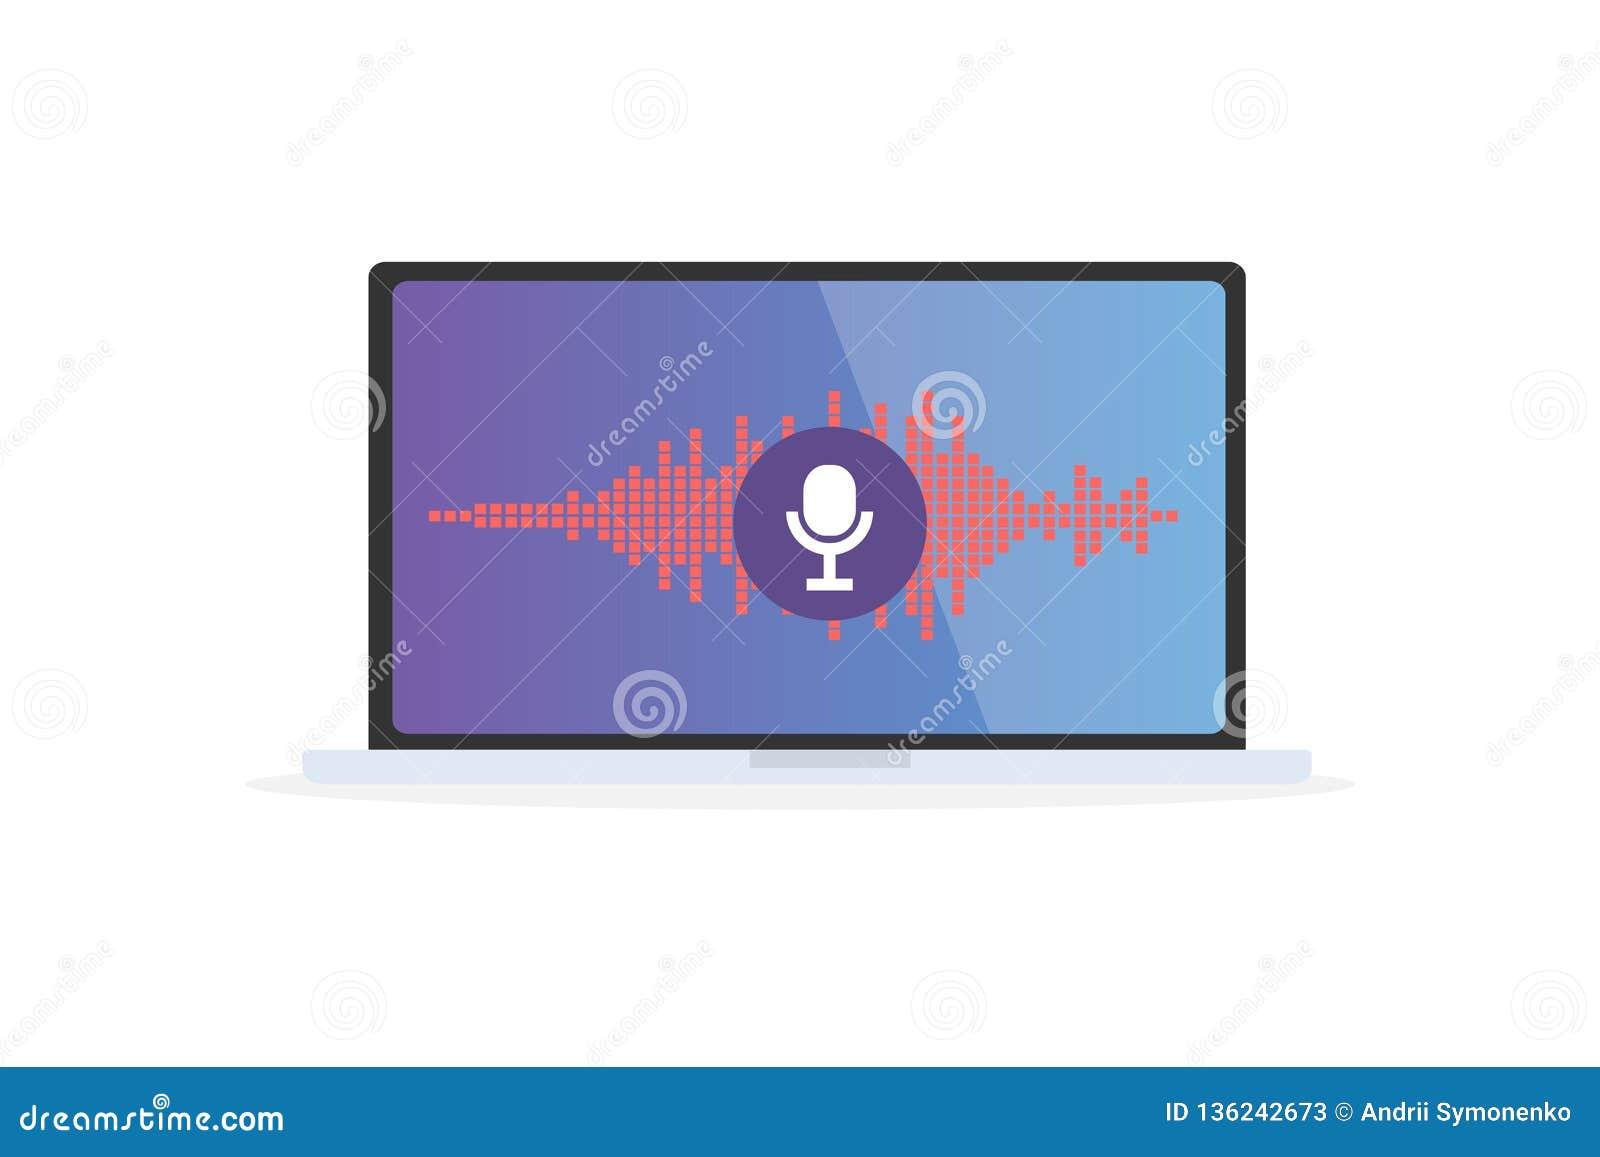 Voice Recognition Personal Assistant On Mobile App  Concept